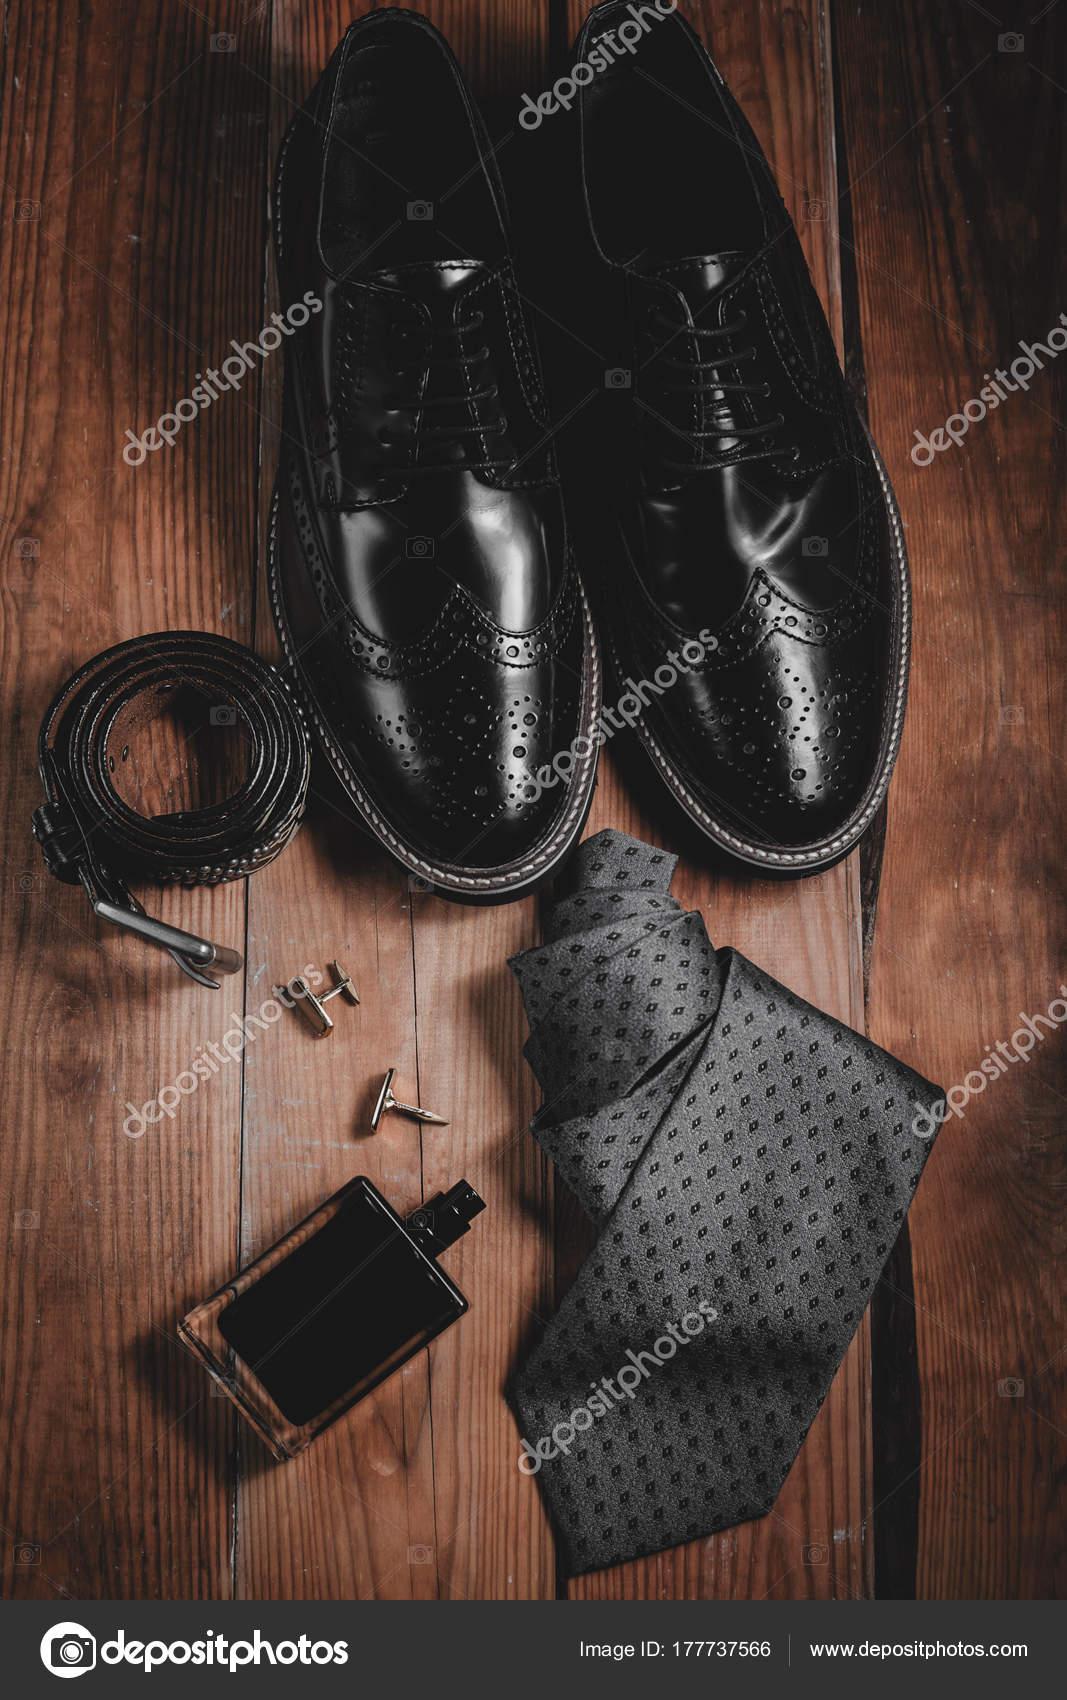 ff9956e0e4c Ανδρικά casual ρούχα και αξεσουάρ, παπούτσια μαύρο δέρμα, ζώνη και άρωμα —  Εικόνα από Martyna1802